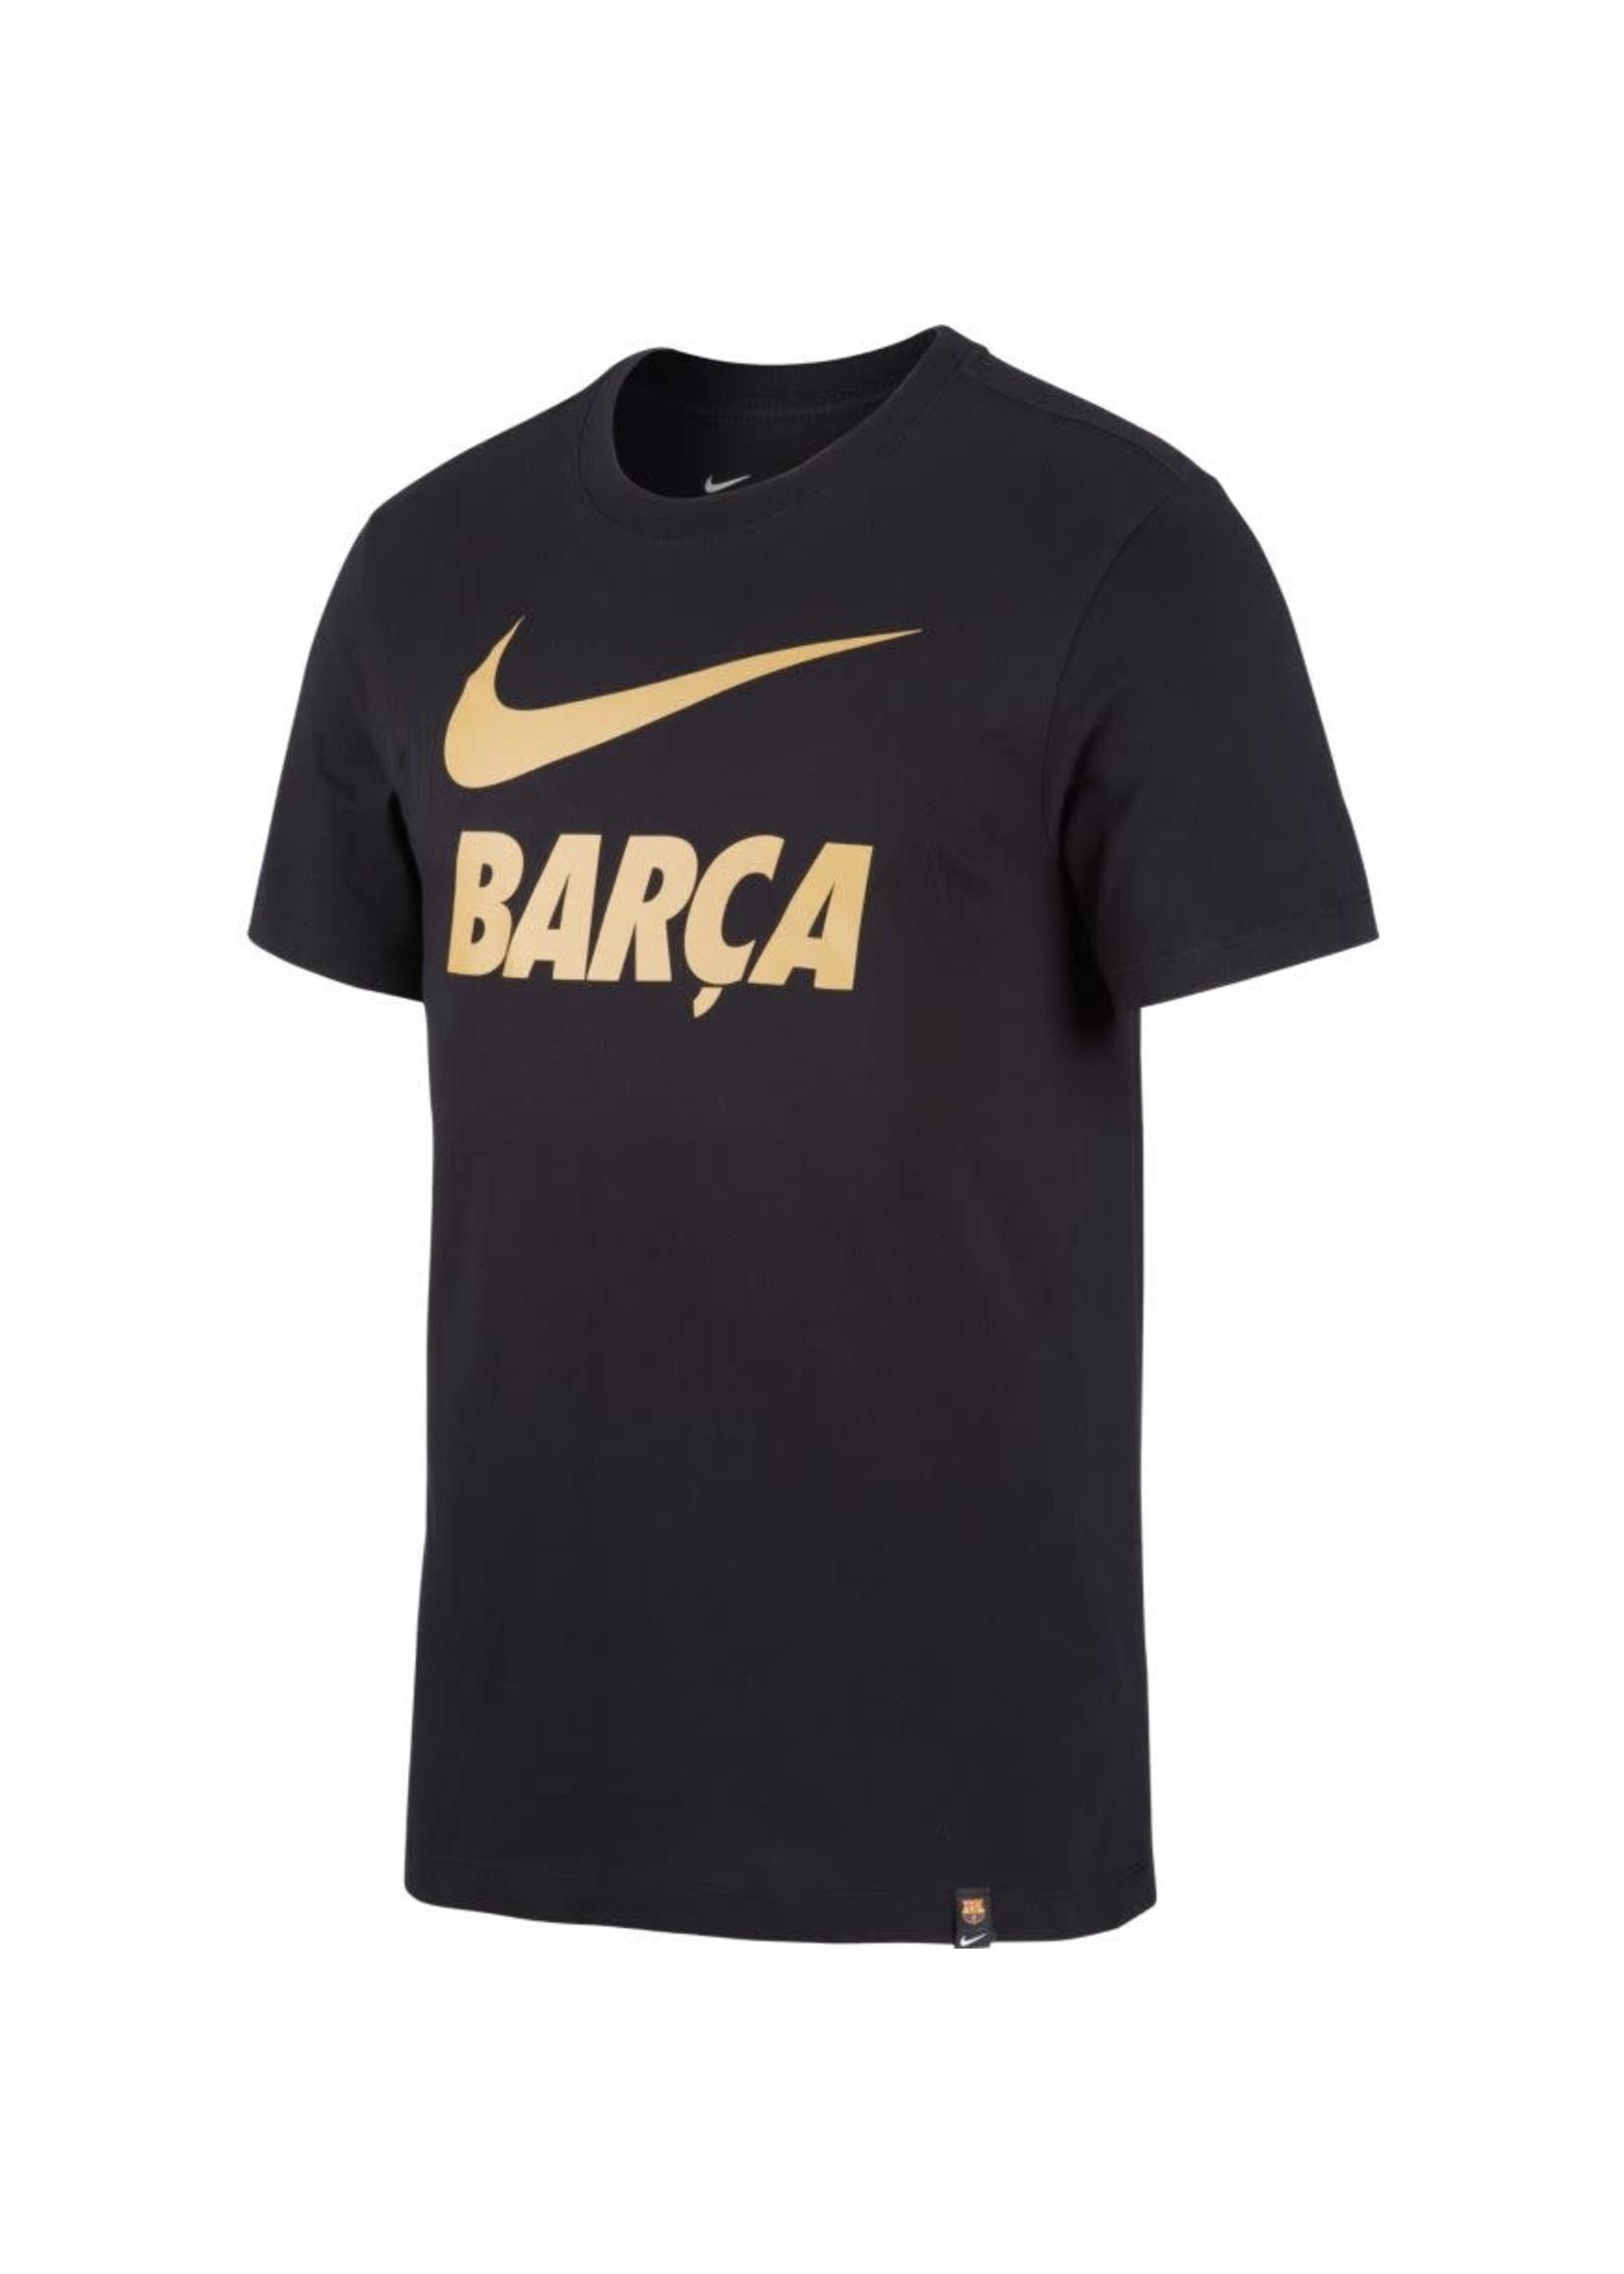 Nike Barcelona T-Shirt - Black/Gold Barca